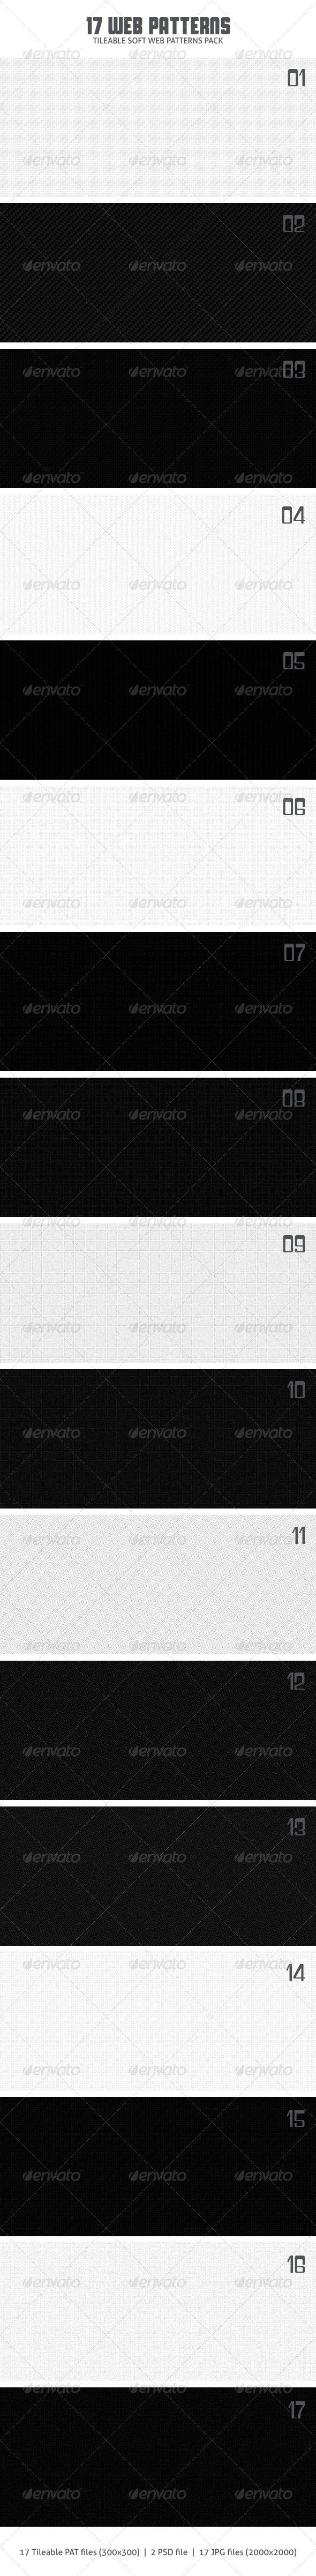 17 Web Patterns - Miscellaneous Textures / Fills / Patterns